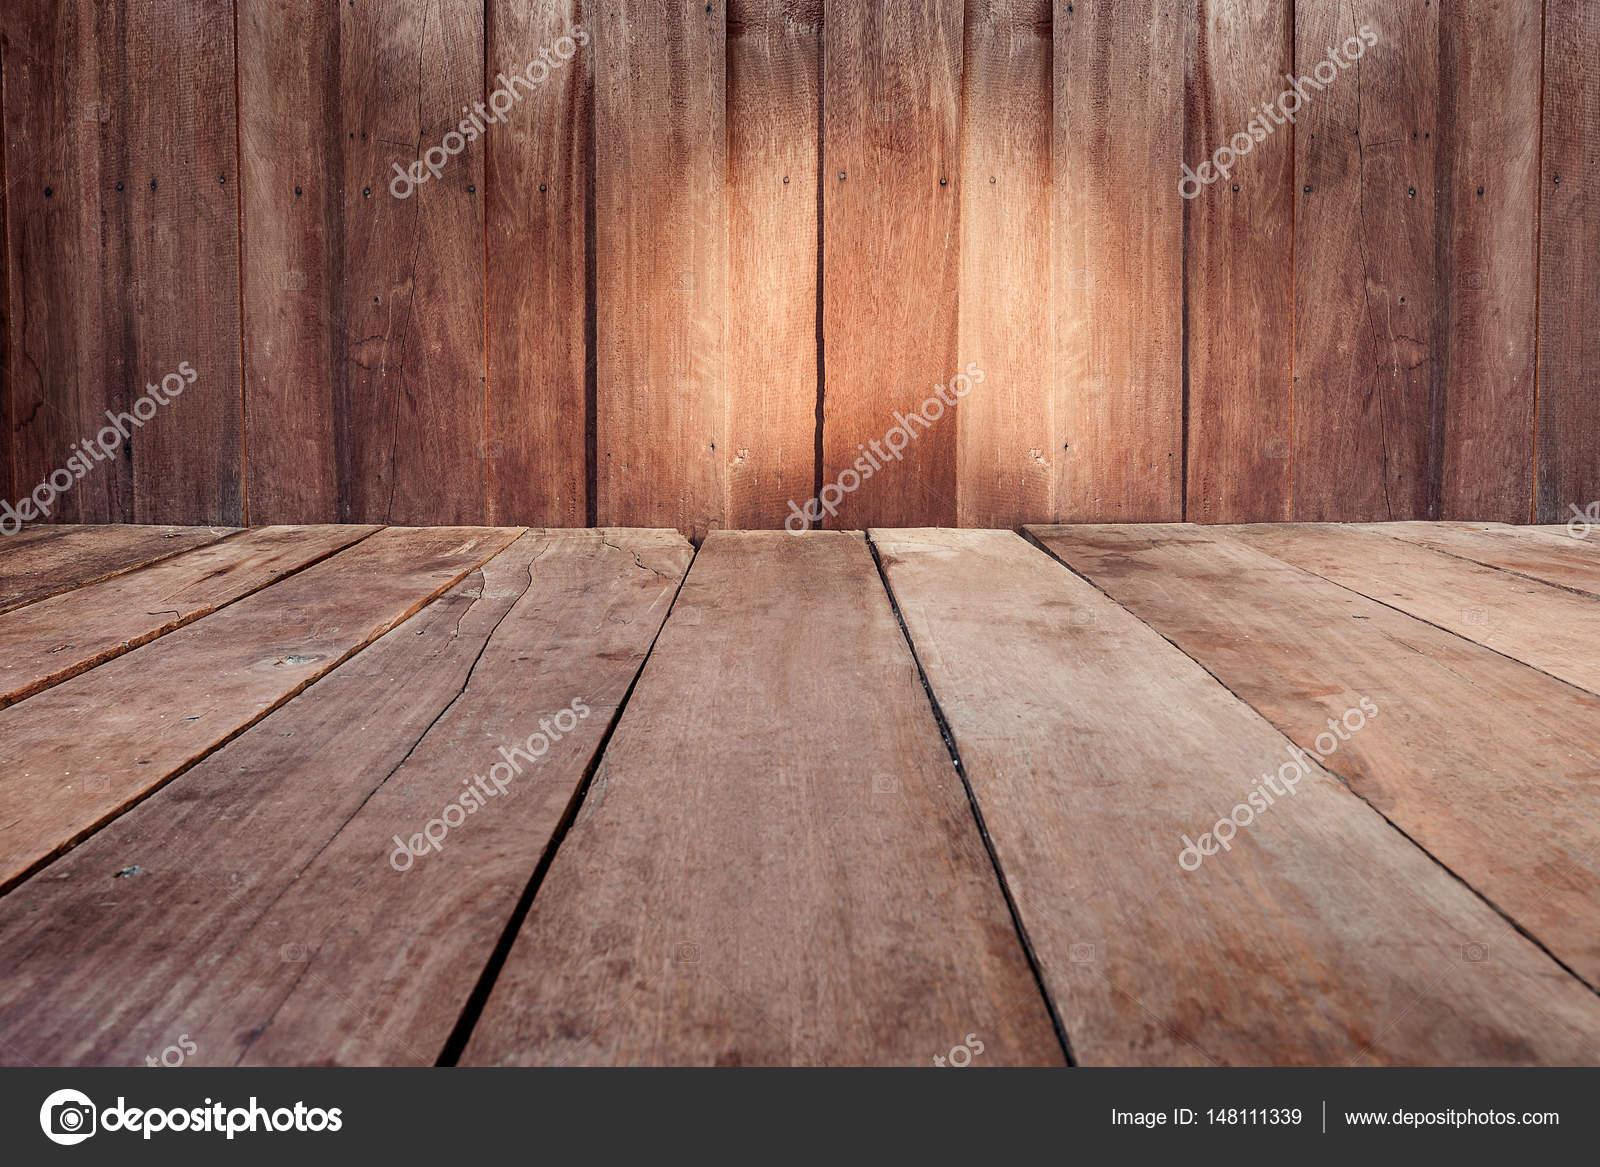 Plank Aan Wand.Vintage Plank Houten Wand En Vloer Gevelbekleding Achtergrond